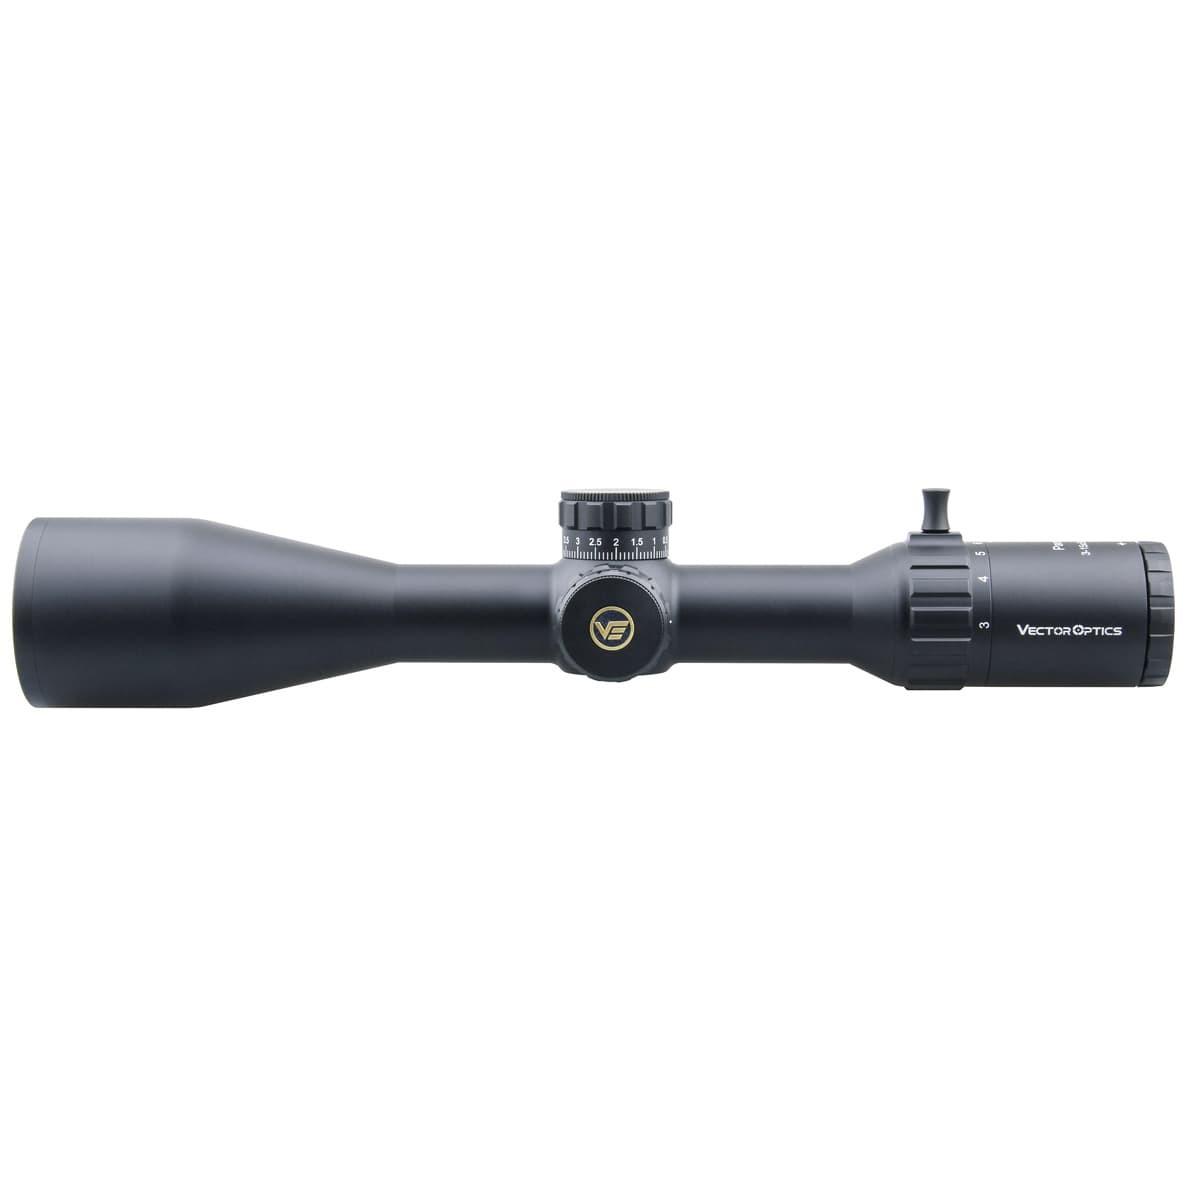 Paragon 3-15x50SFP GenII Riflescope